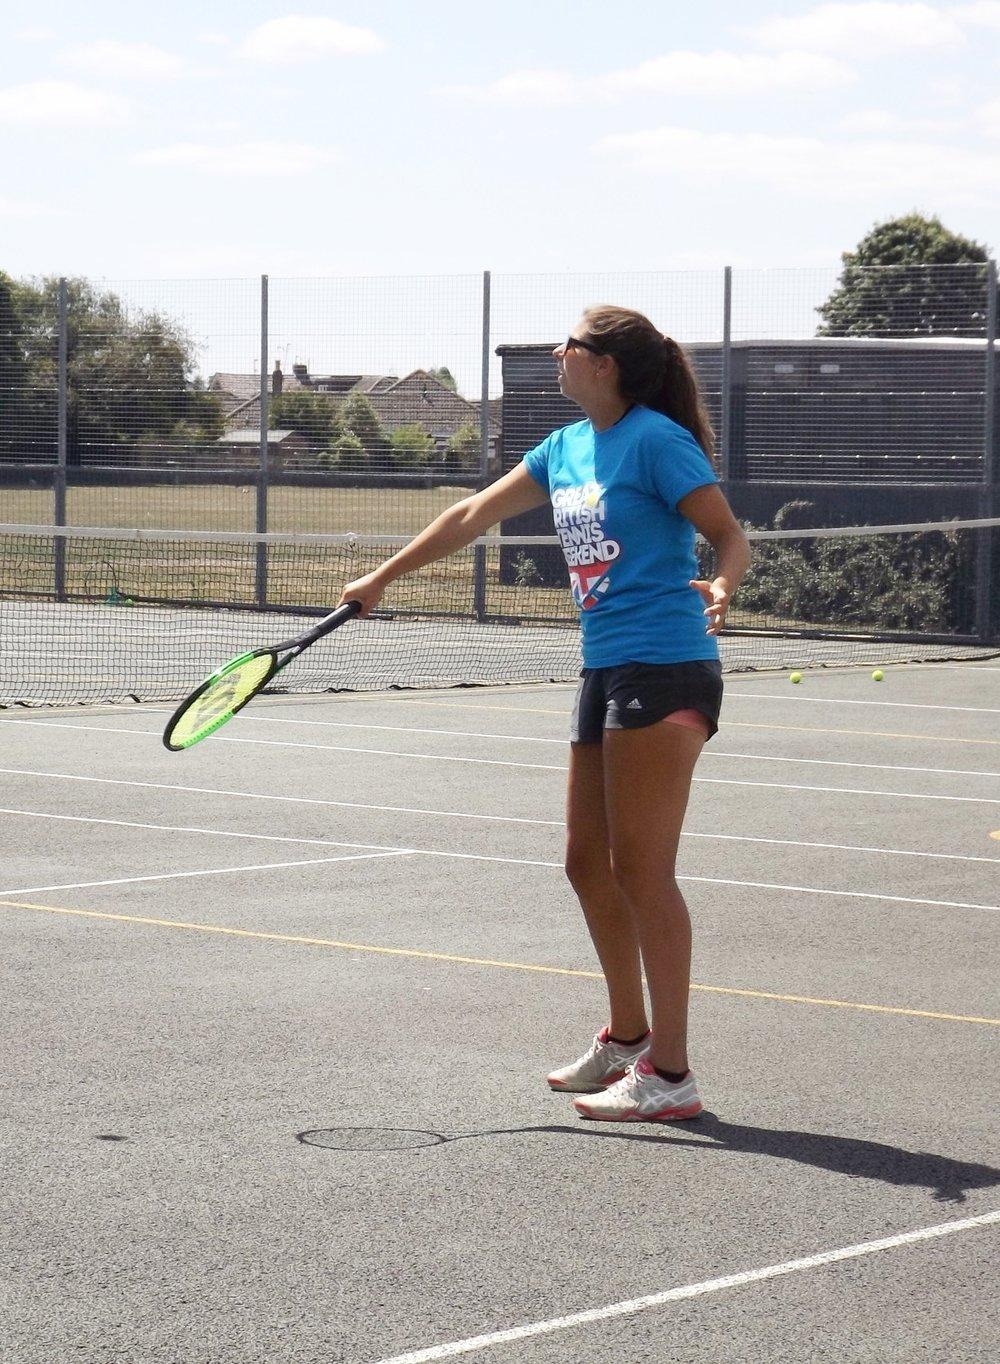 Hi!I'm Sophie - LTA Level 2 Tennis CoachDate Joined: July 2018Status: Active